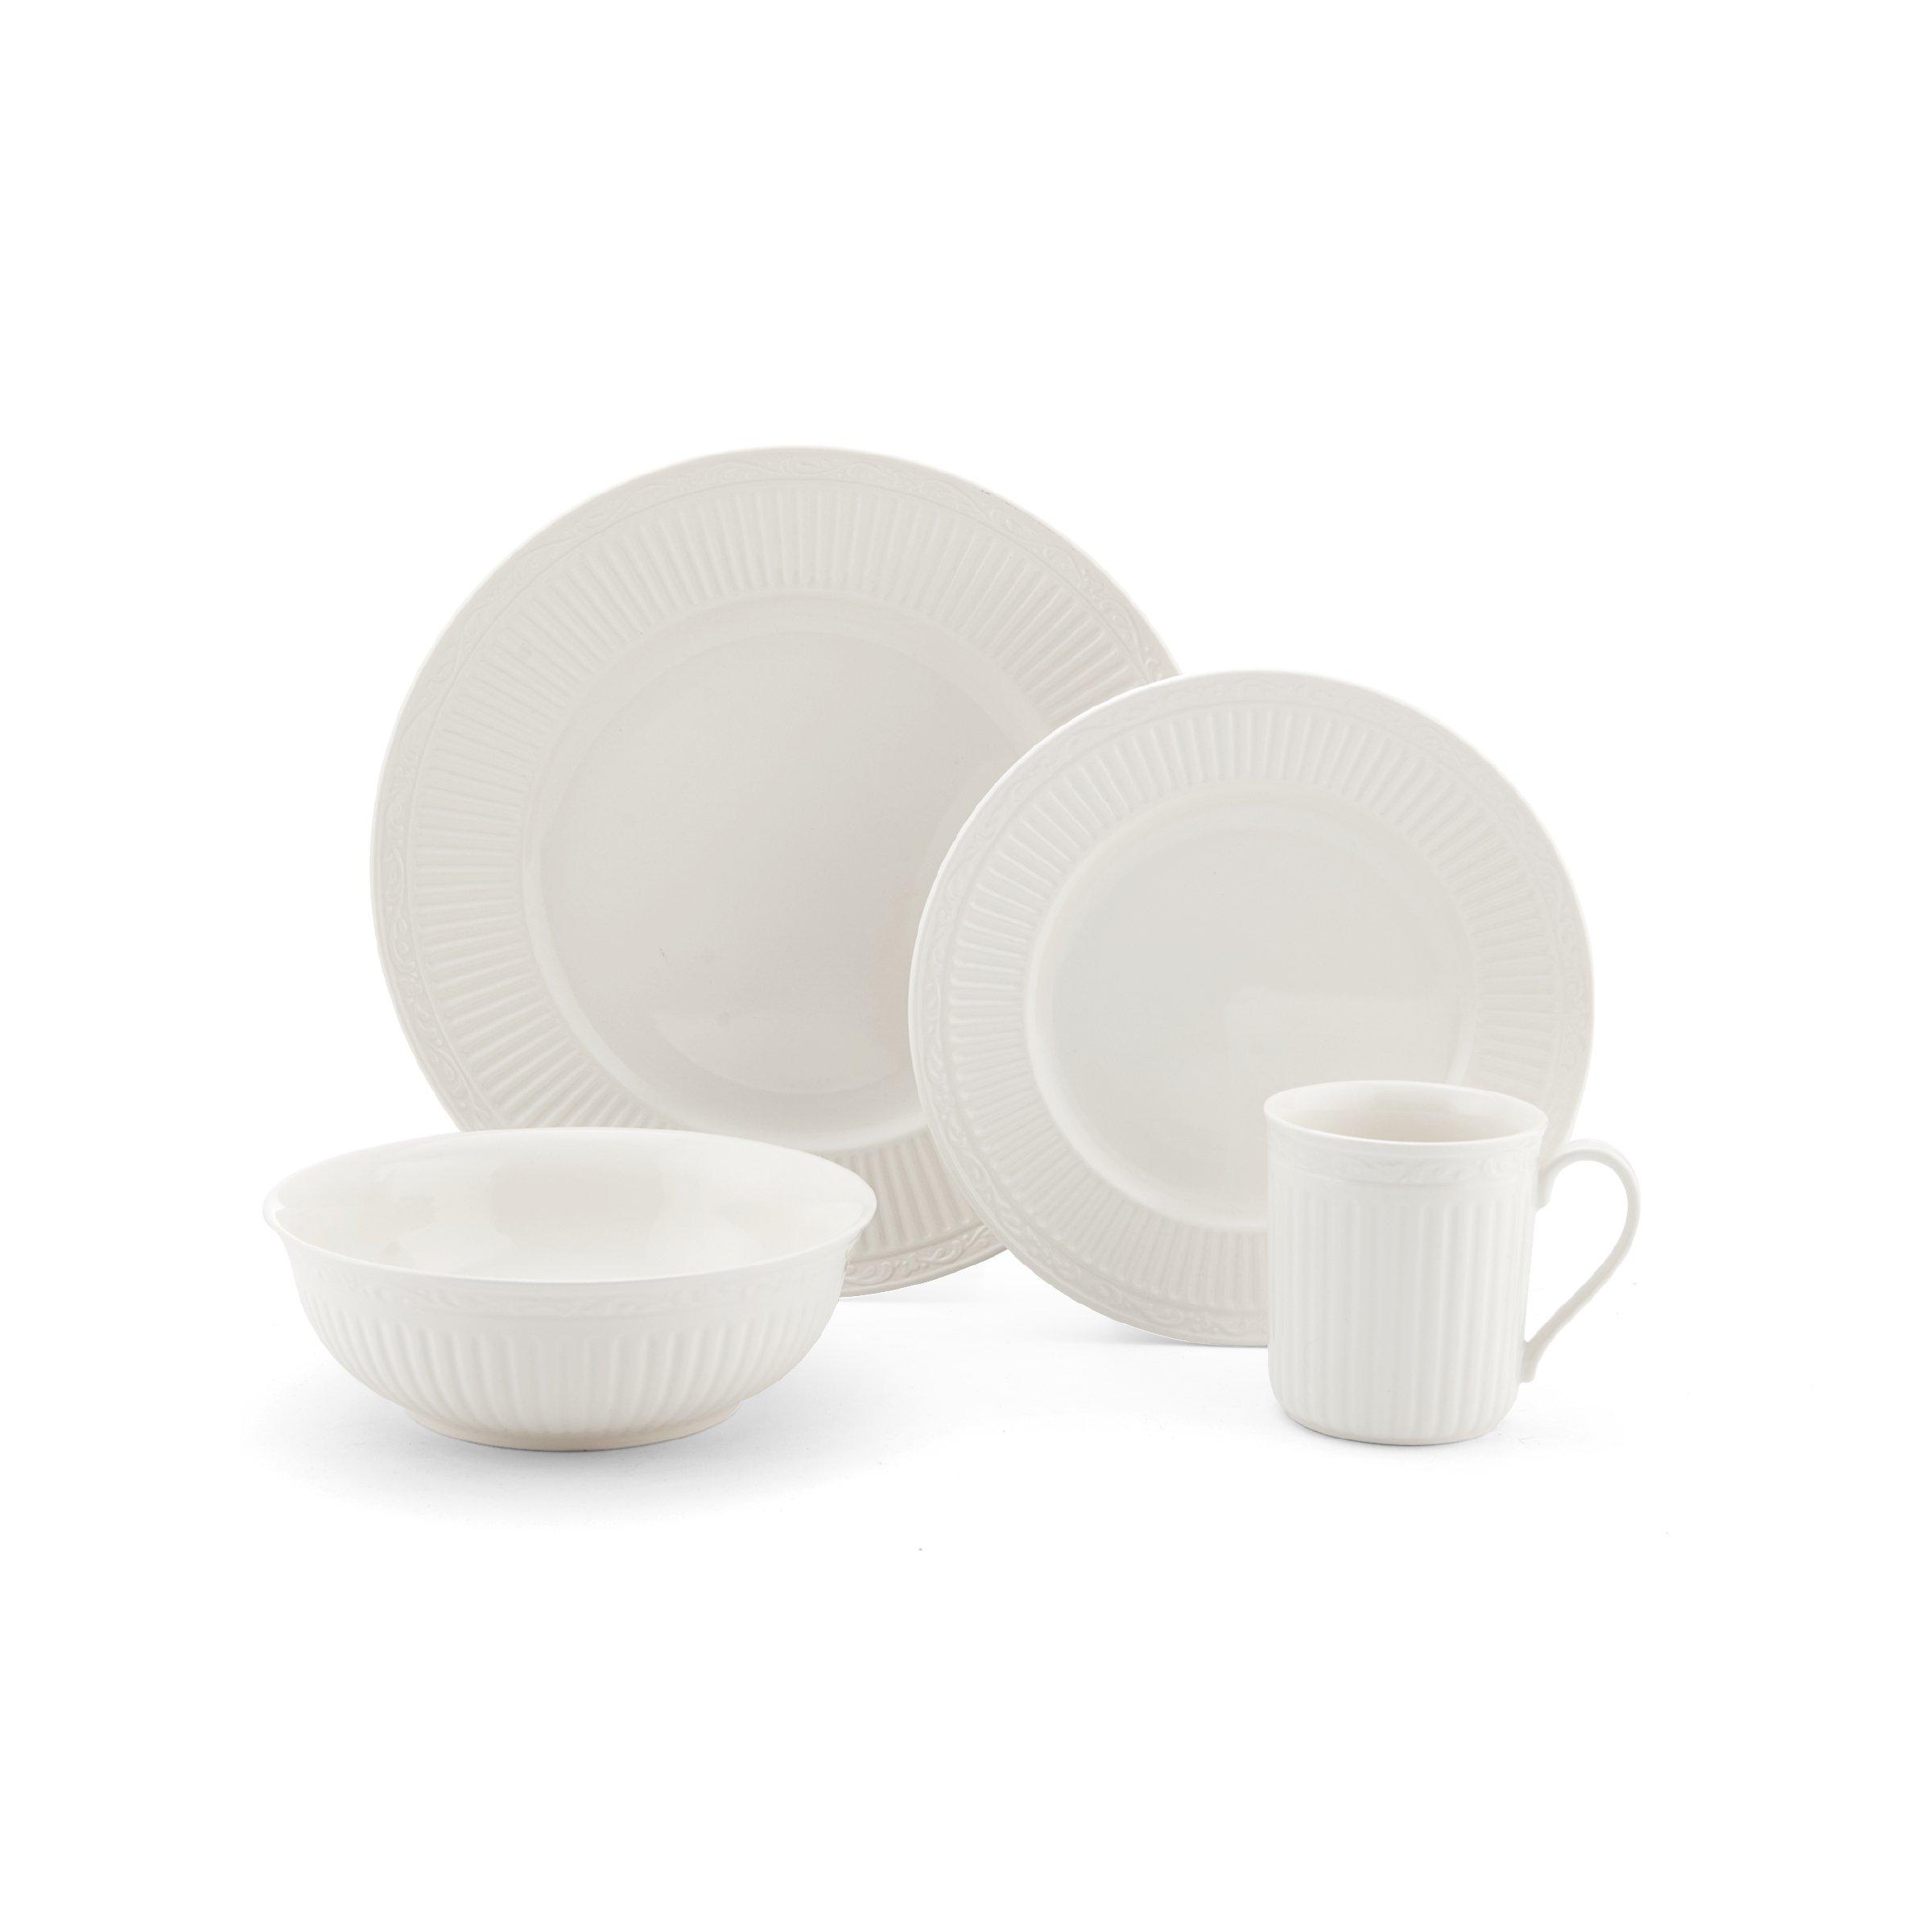 Mikasa 5223386 Italian Countryside 16-Piece Dinnerware Set, Service for 4